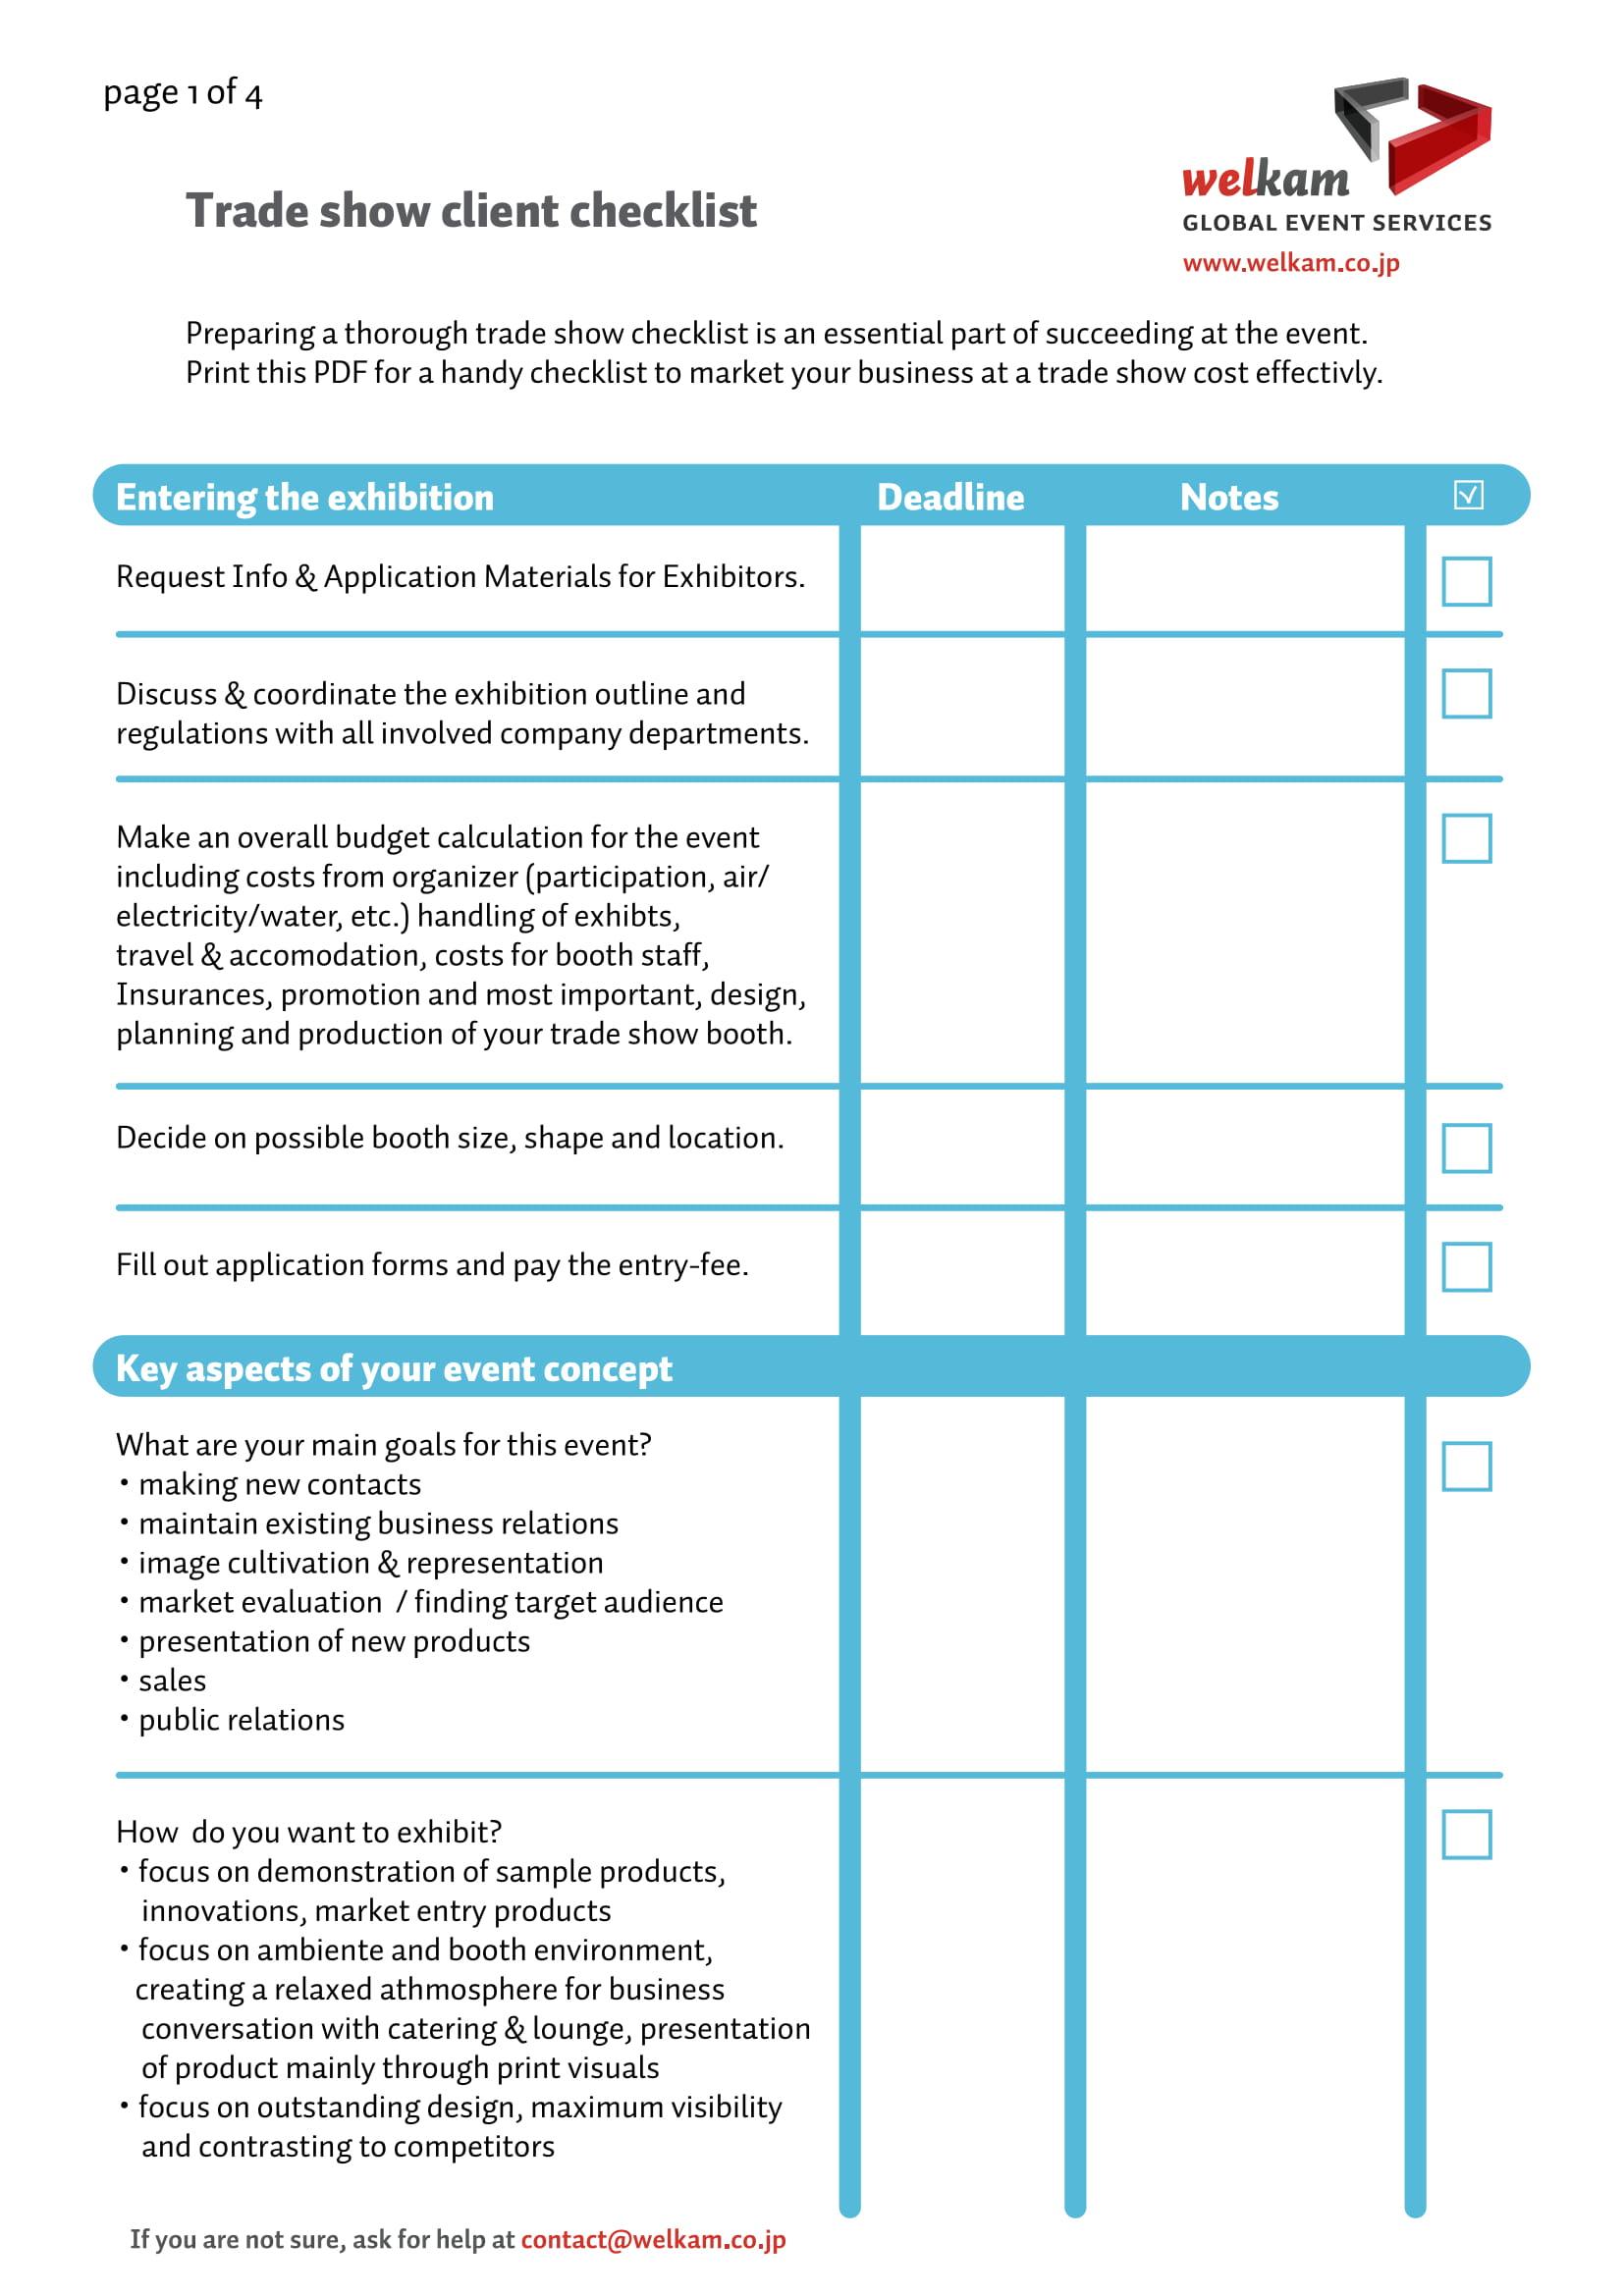 9 Trade Show Checklist Examples Pdf Examples